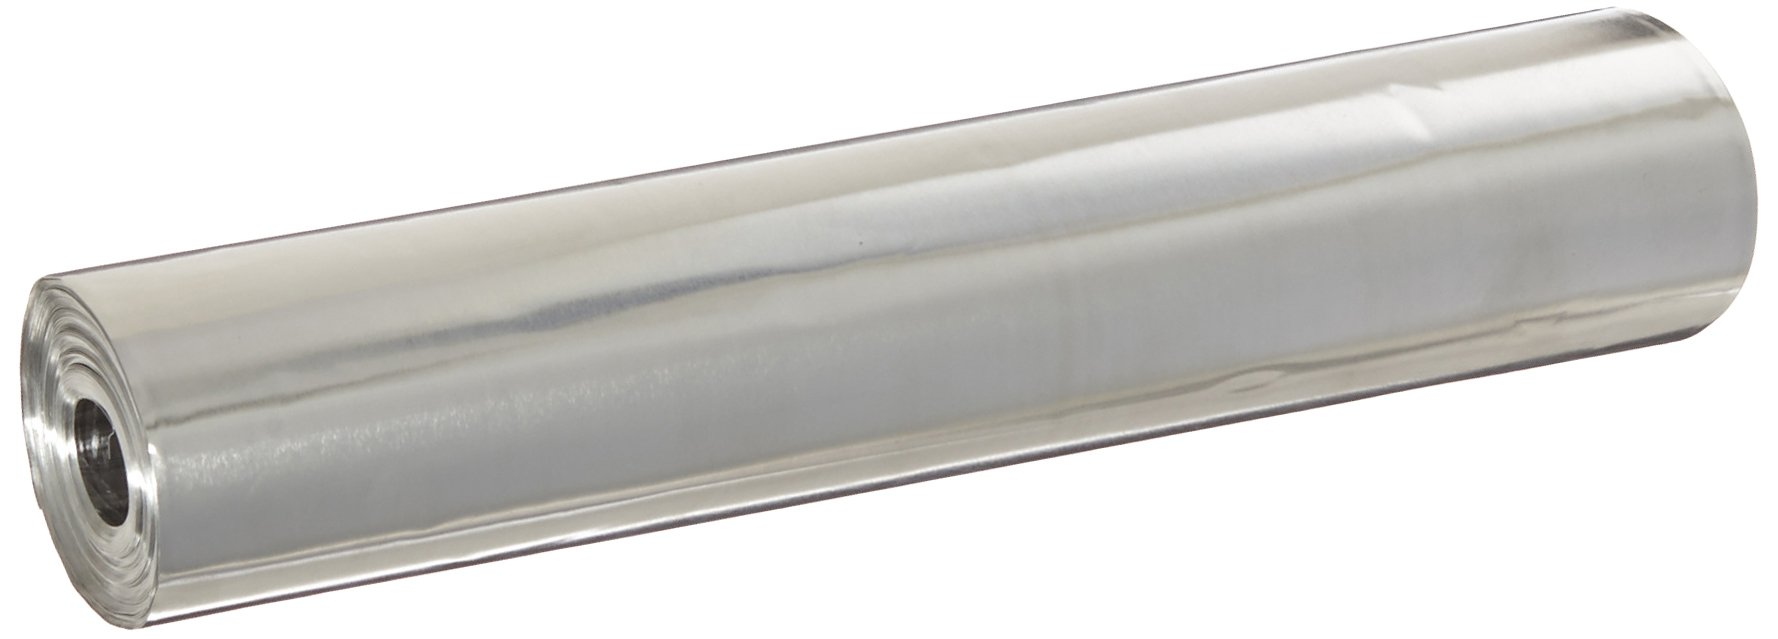 St Louis Crafts 36 Gauge Aluminum Metal Foil Roll, 12 Inches x 50 Feet - 567280